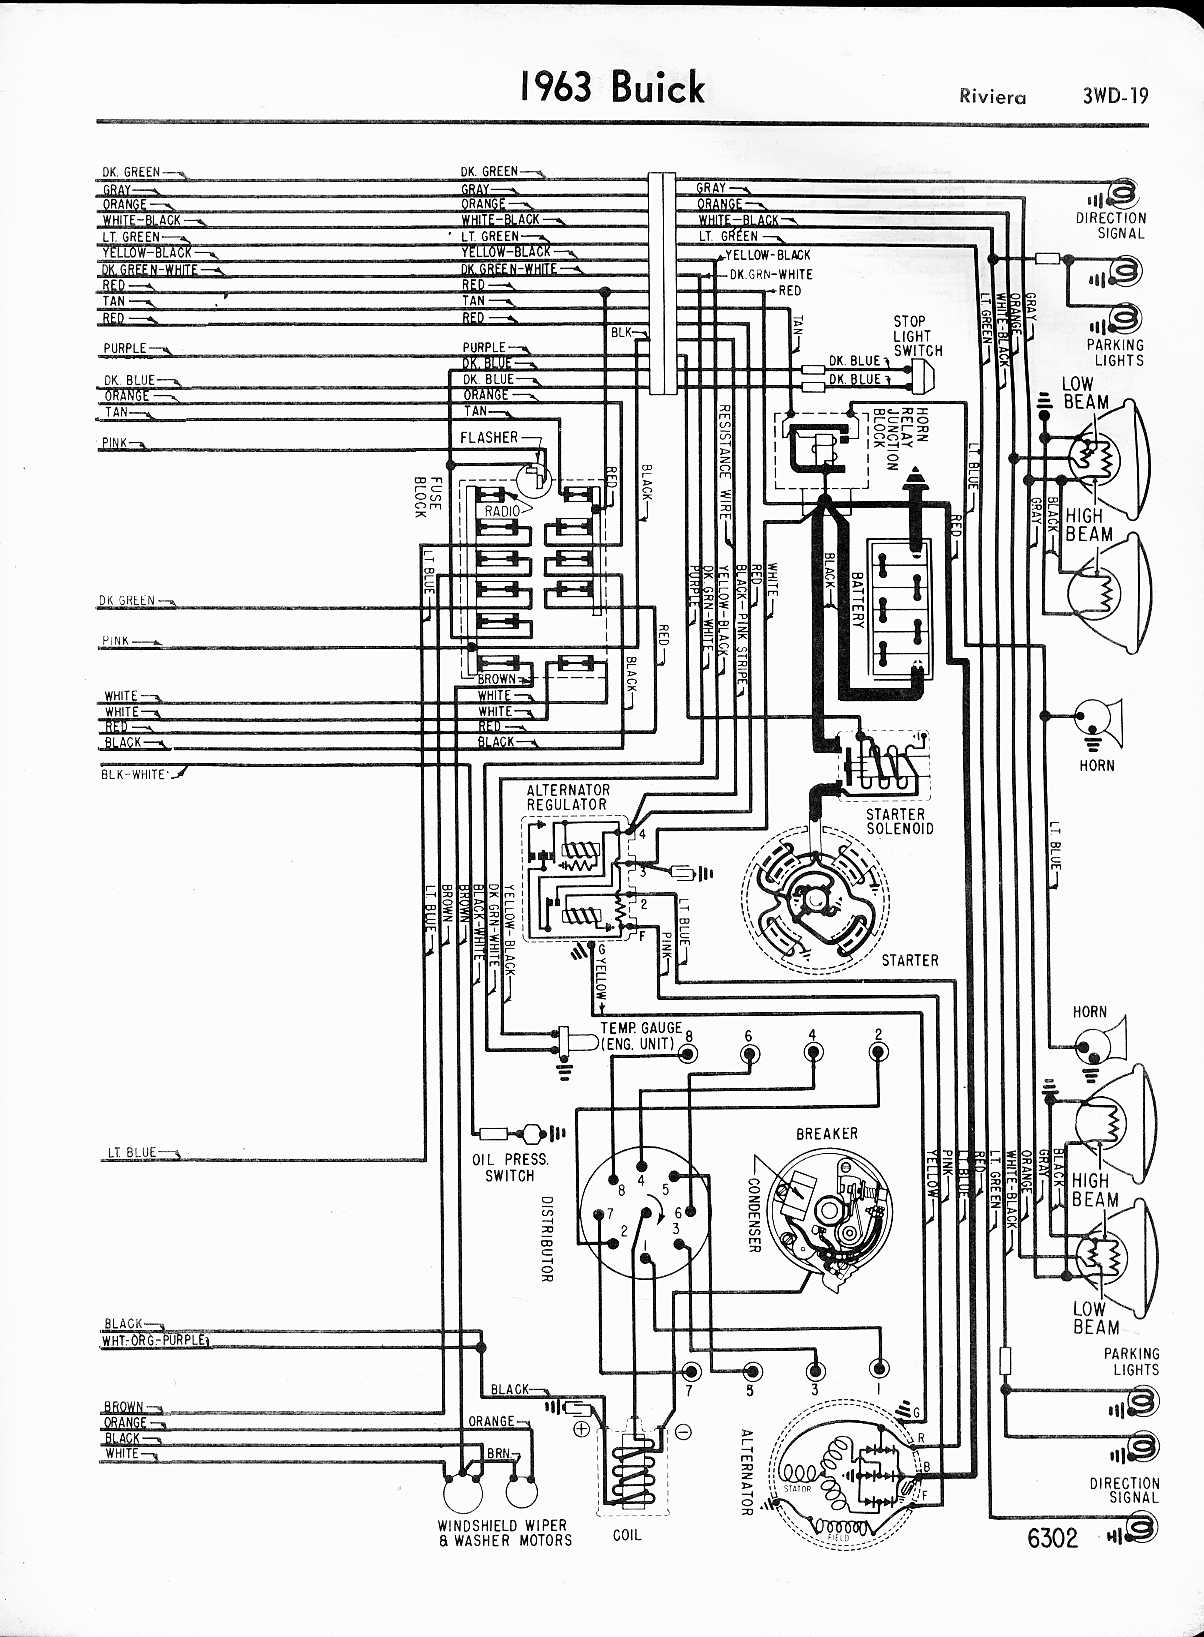 Stupendous Buick Wiring Diagrams 1957 1965 Wiring Cloud Ittabpendurdonanfuldomelitekicepsianuembamohammedshrineorg